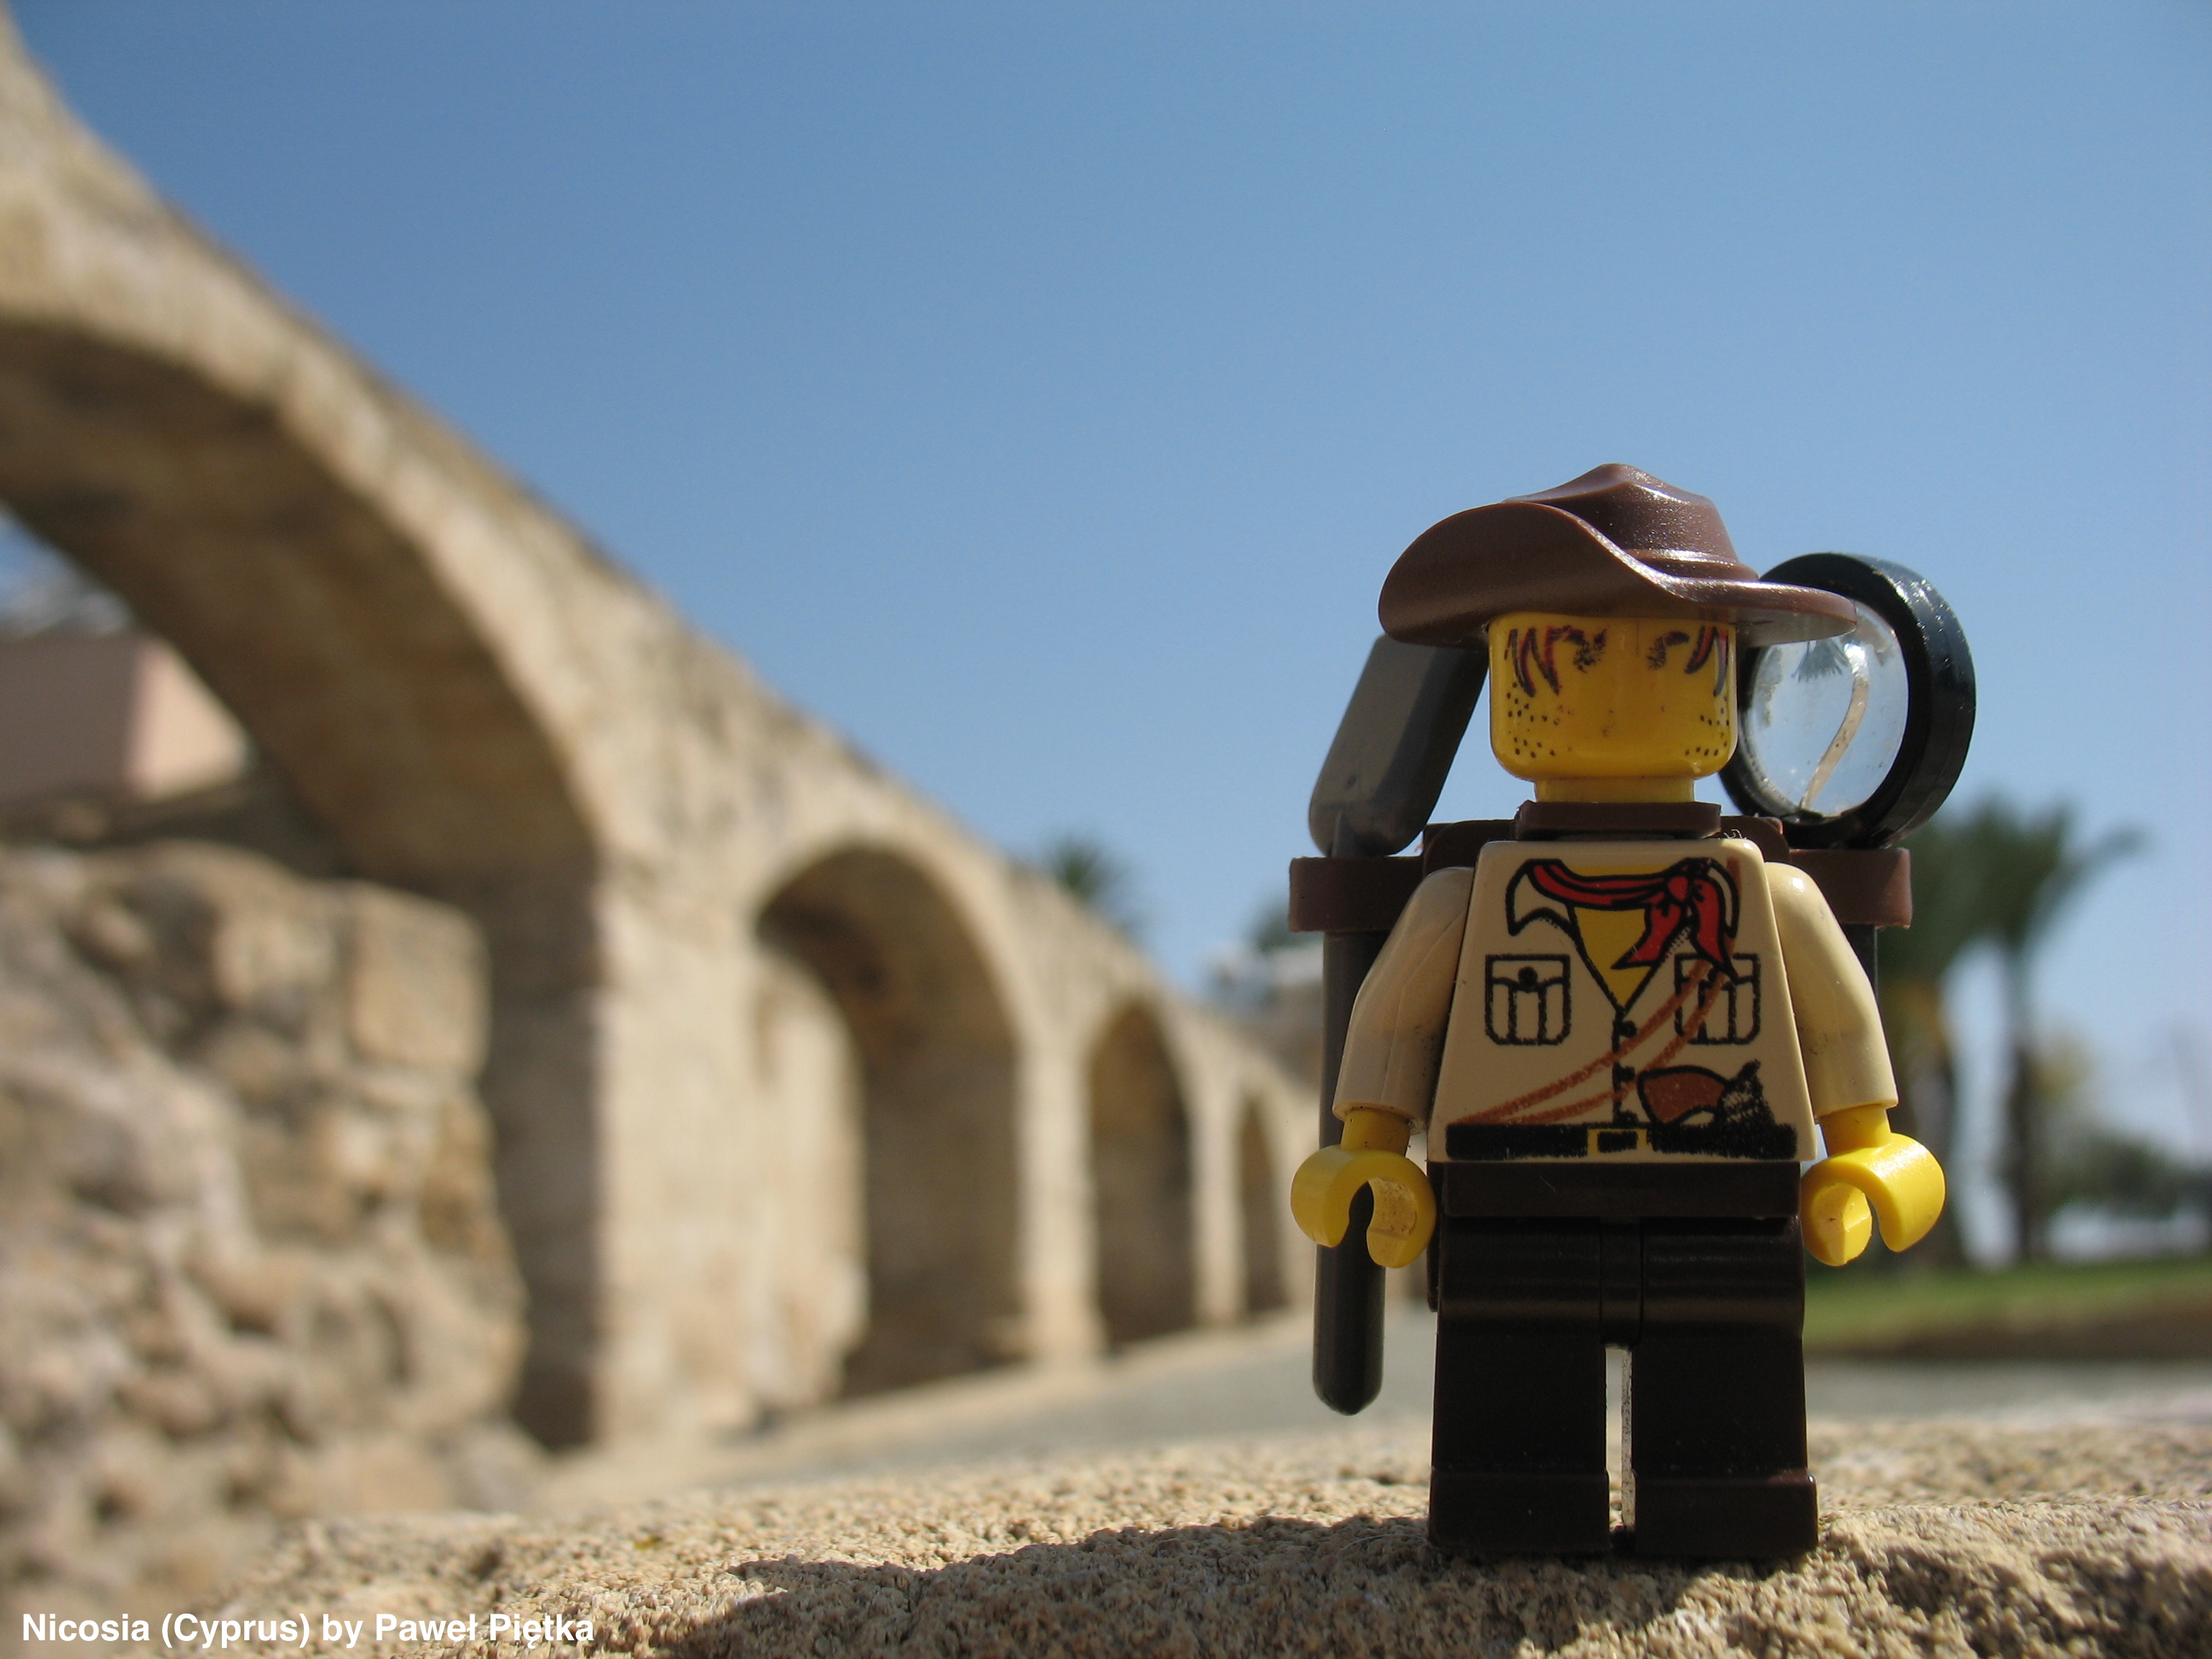 Nicosia (Cyprus) - old aqueduct